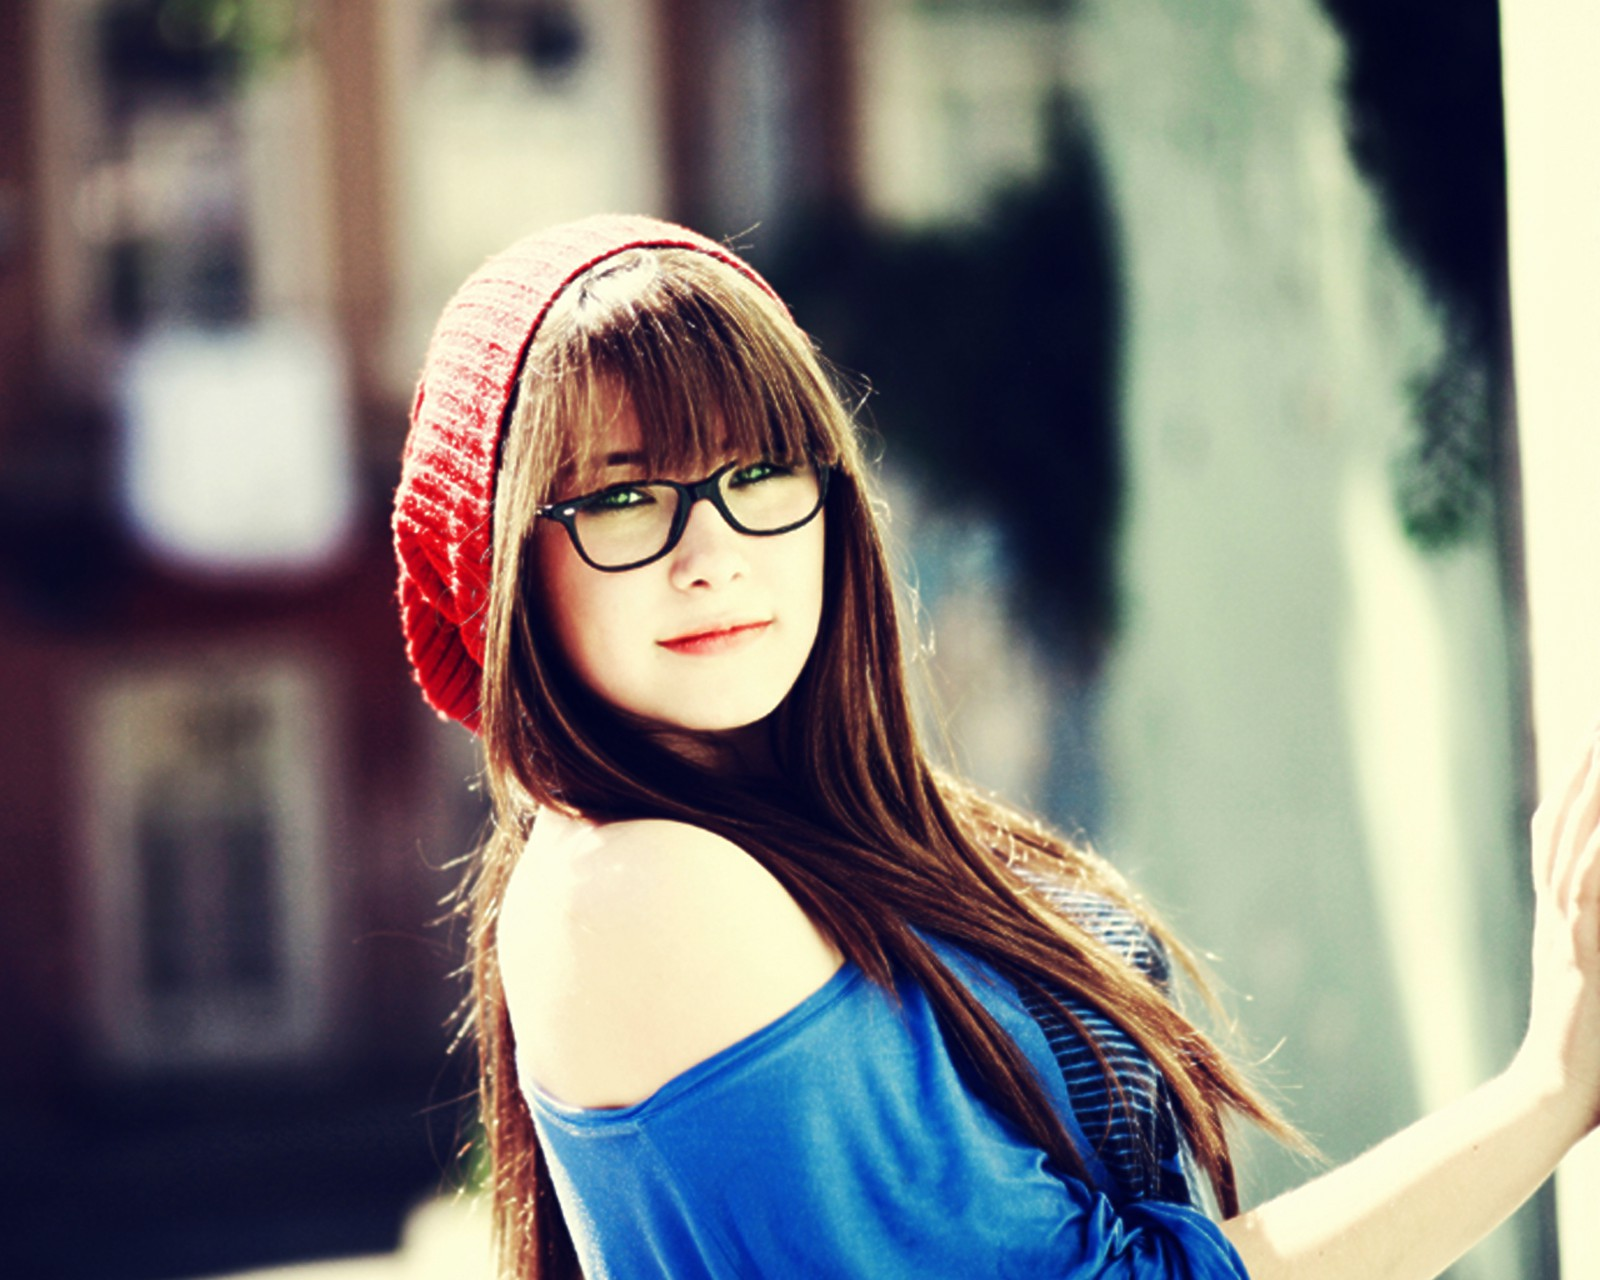 Gambar 19 untuk 4 Alasan Memilih Kacamata Dibanding Contact Lens